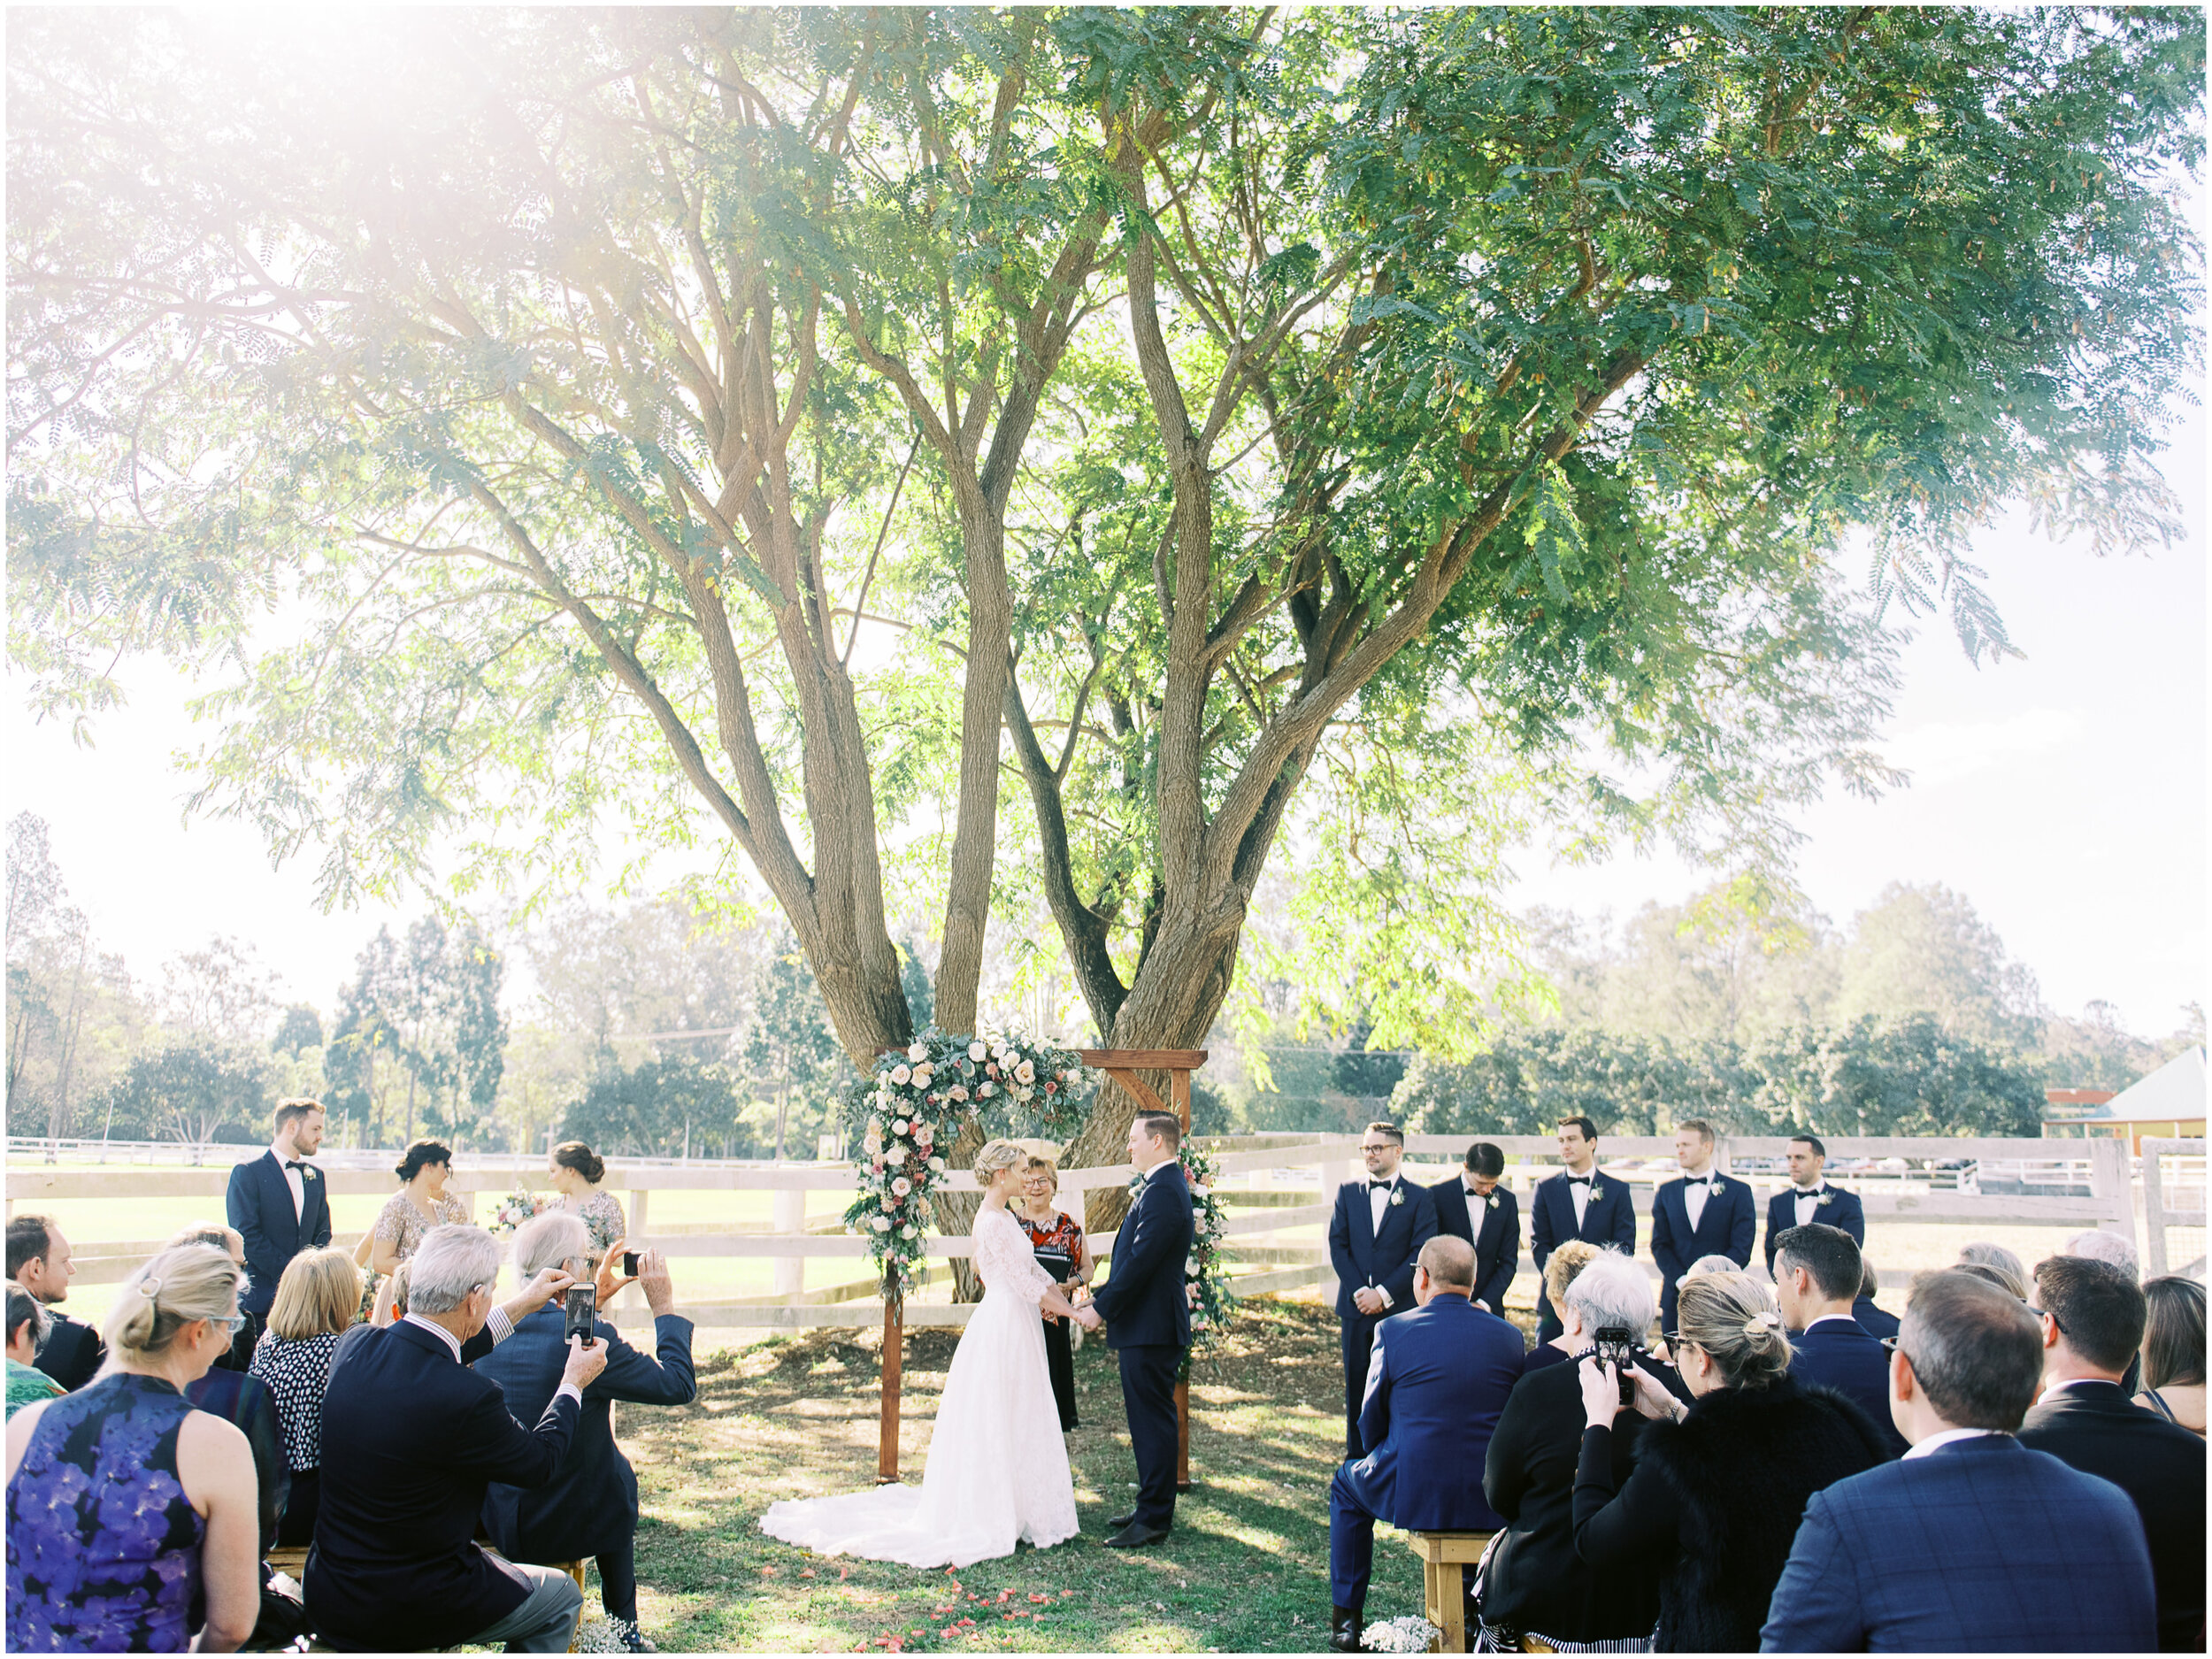 brisbane-film-wedding-photographer-lauren-olivia-luxury-wedding-australia-01-06.jpg